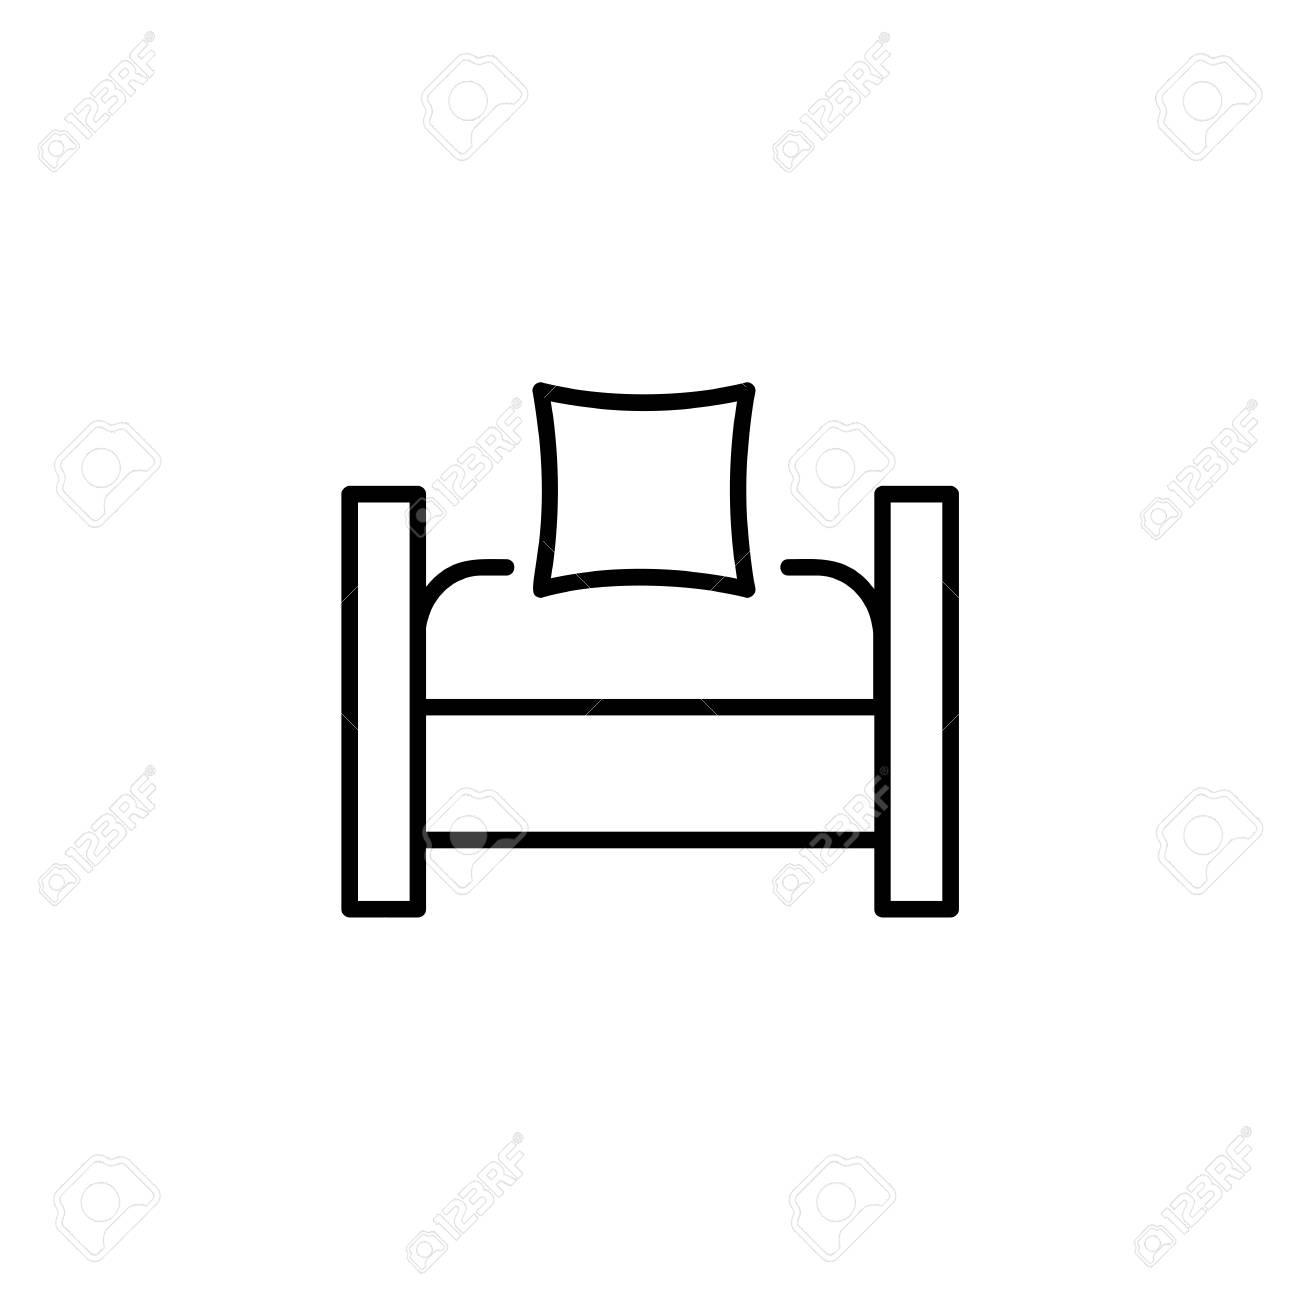 Groovy Black White Vector Illustration Of Sleeper Convertible Chair Inzonedesignstudio Interior Chair Design Inzonedesignstudiocom